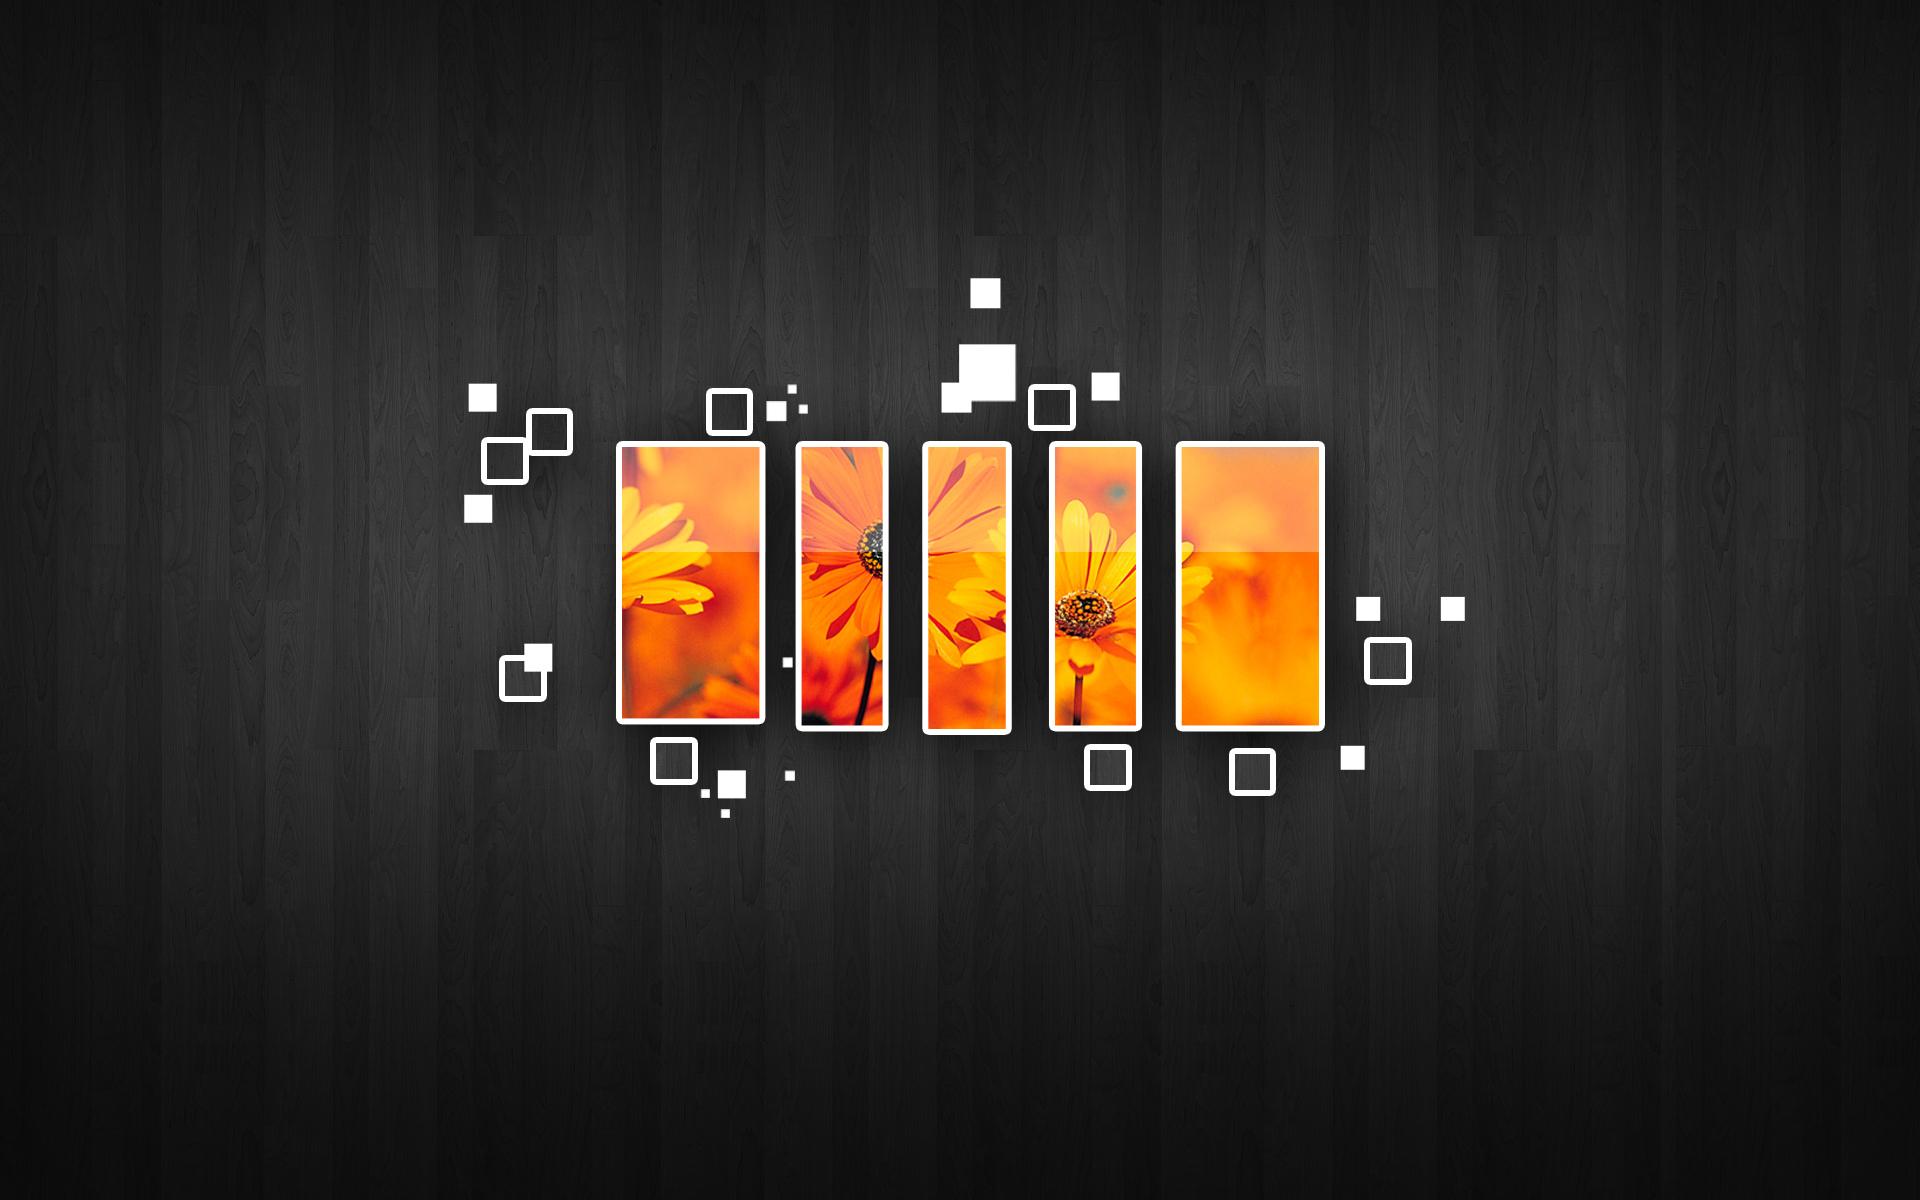 Pc Wallpaper Full Hd 3d Design Backgrounds Download Pixelstalk Net